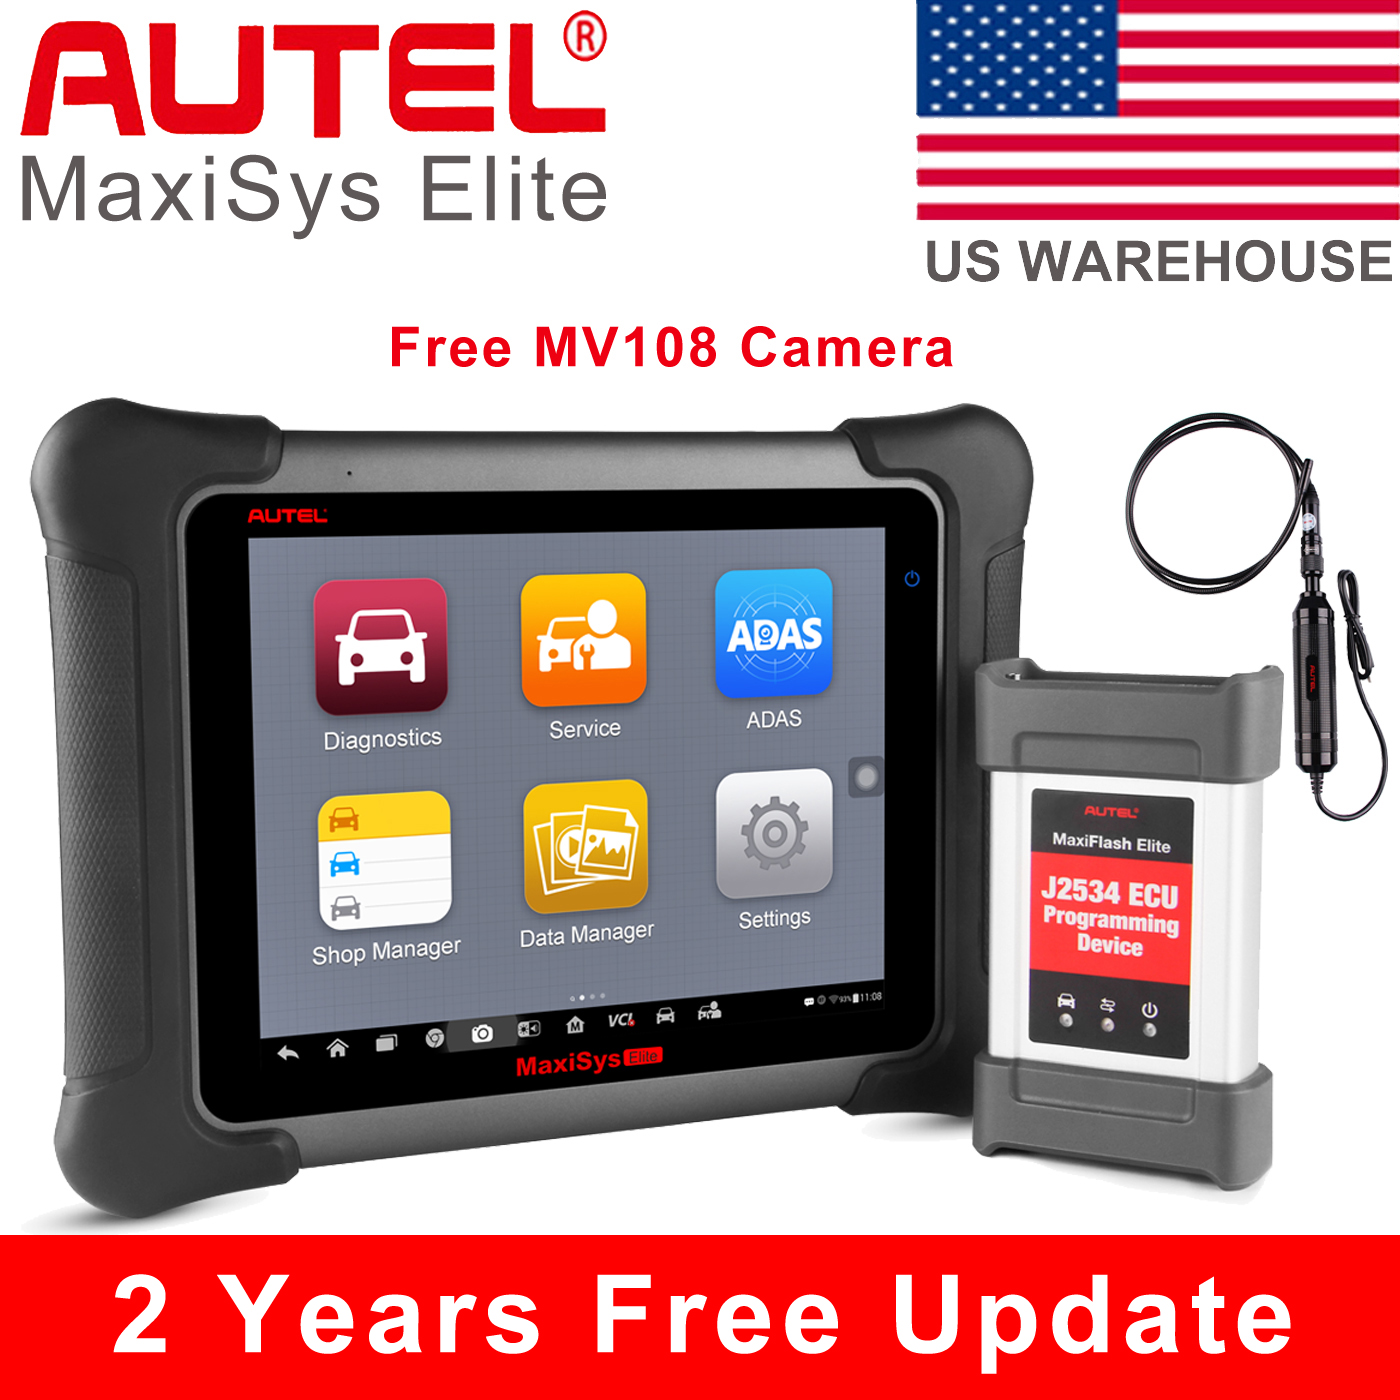 Autel MaxiSys Elite Auto Diagnostic Tool J2534 ECU Reprogram